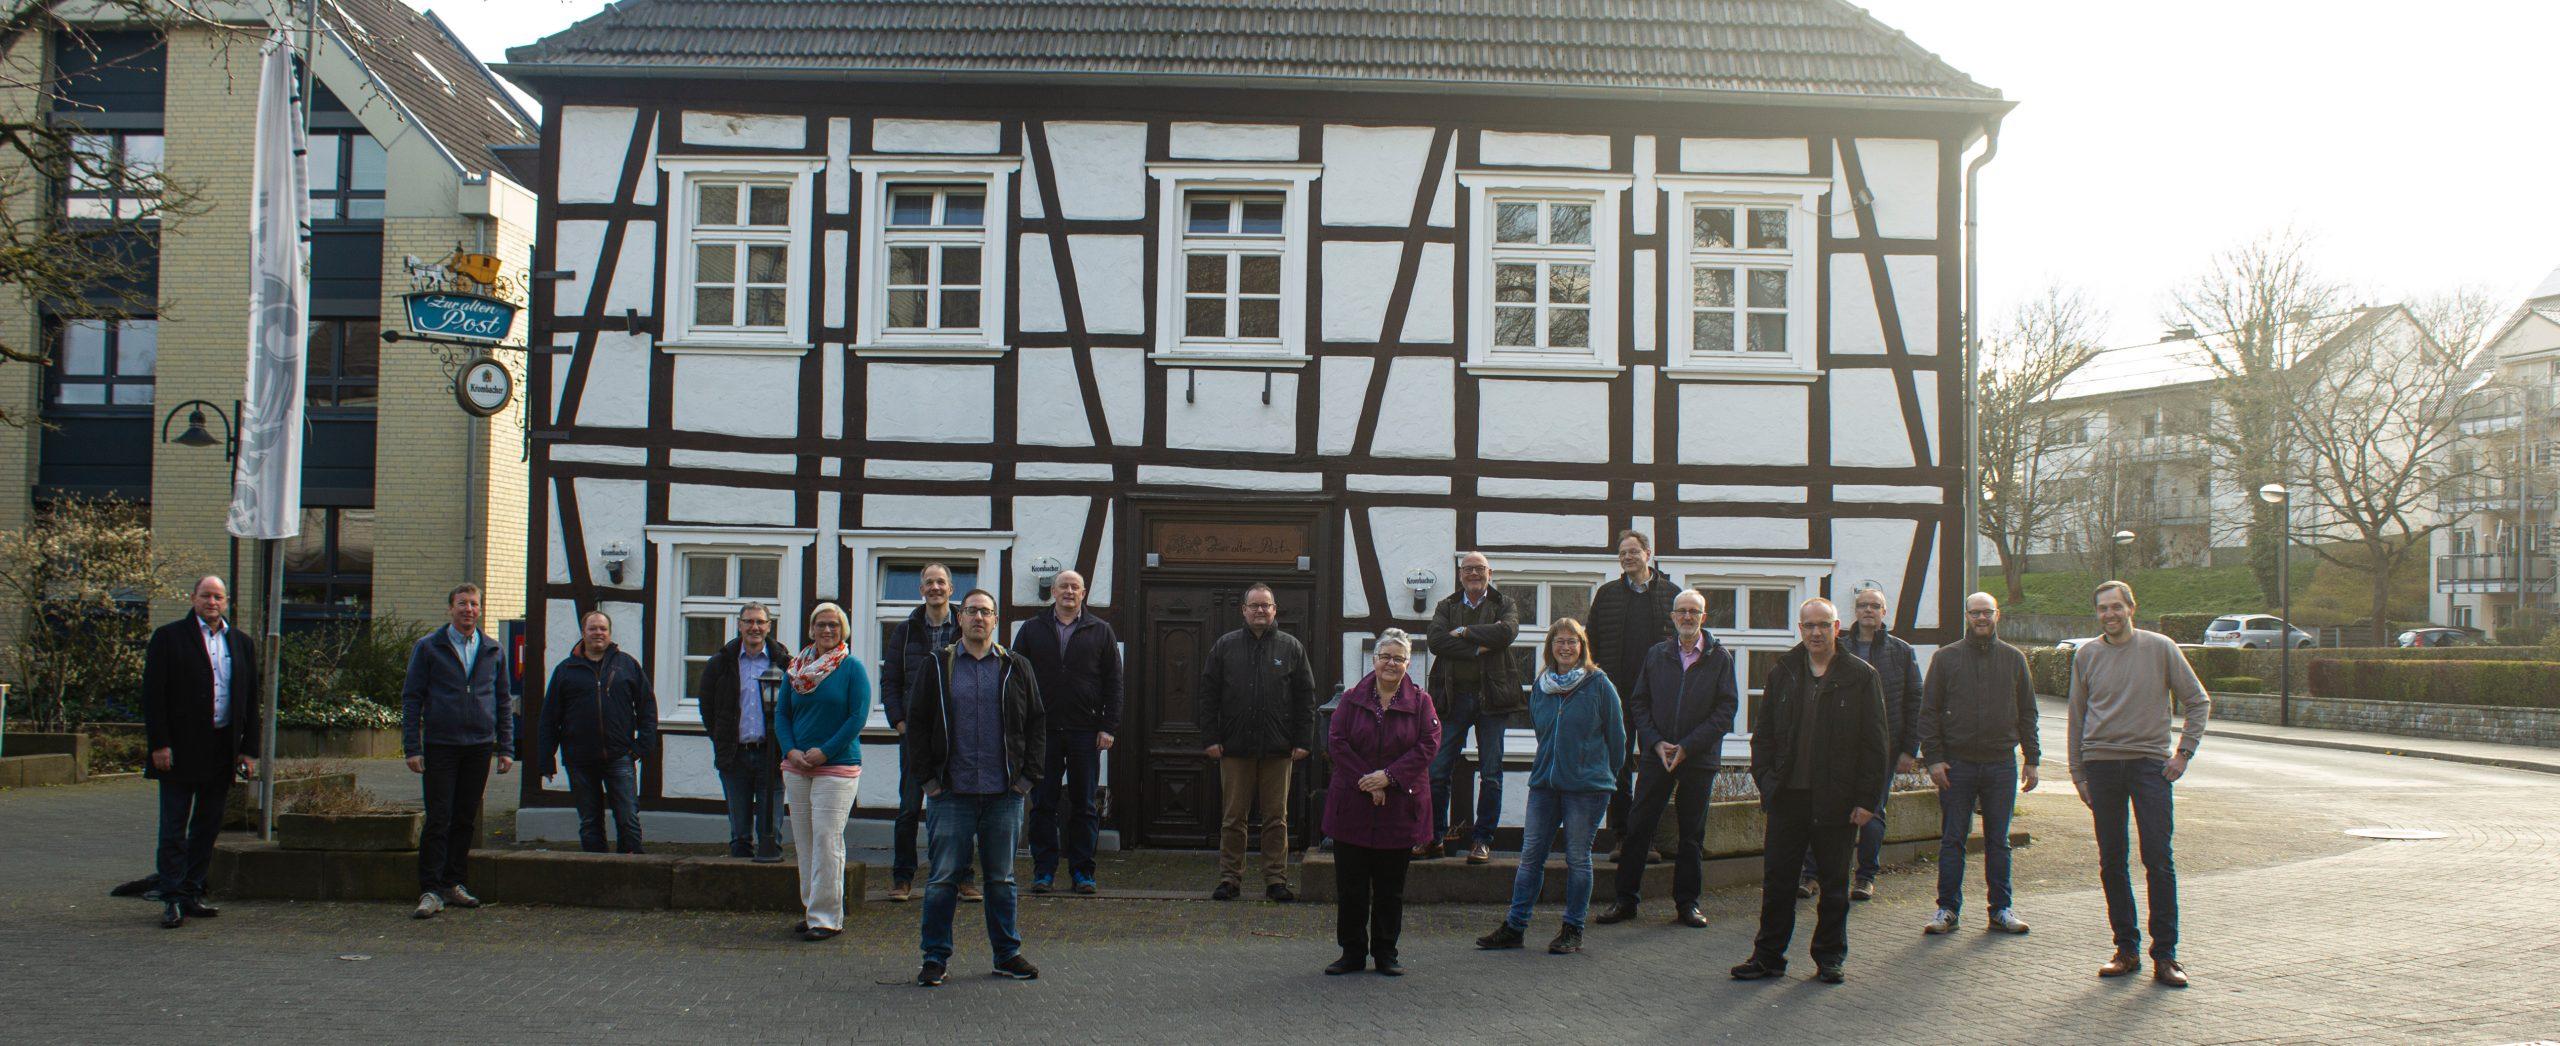 Bürgergenossenschaft Alte Post